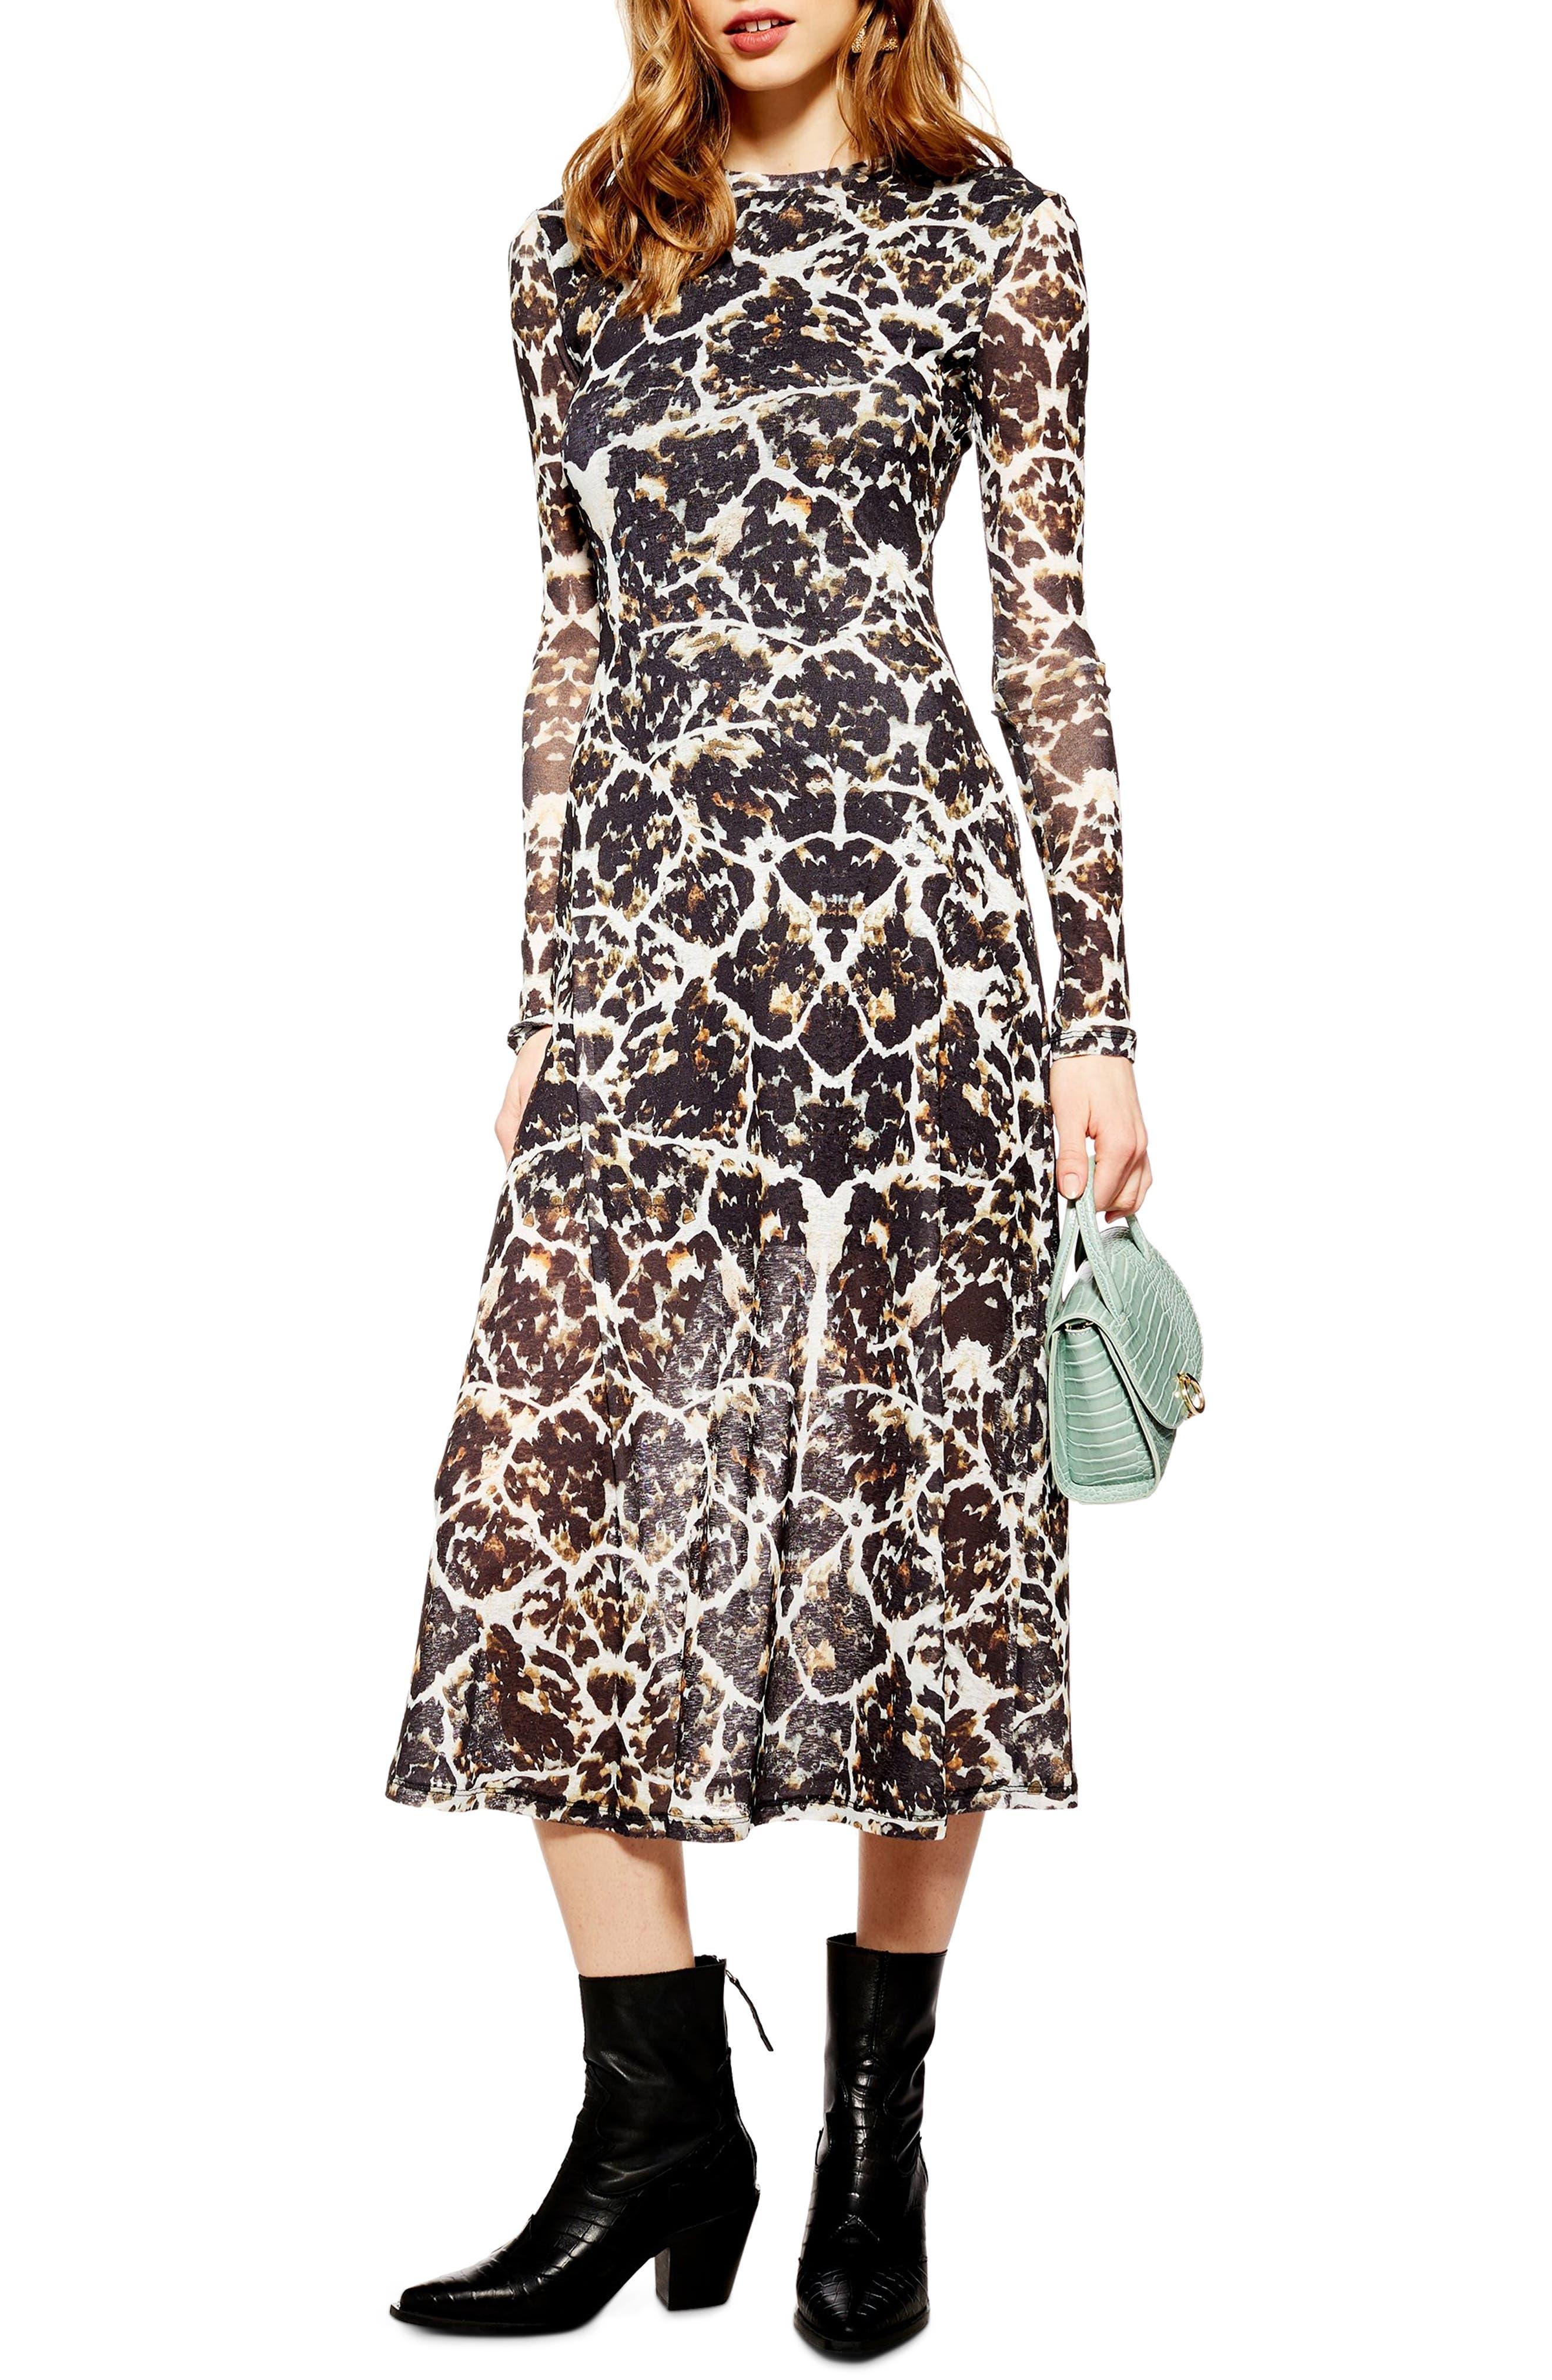 Topshop Tortoiseshell Long Sleeve Mesh Midi Dress